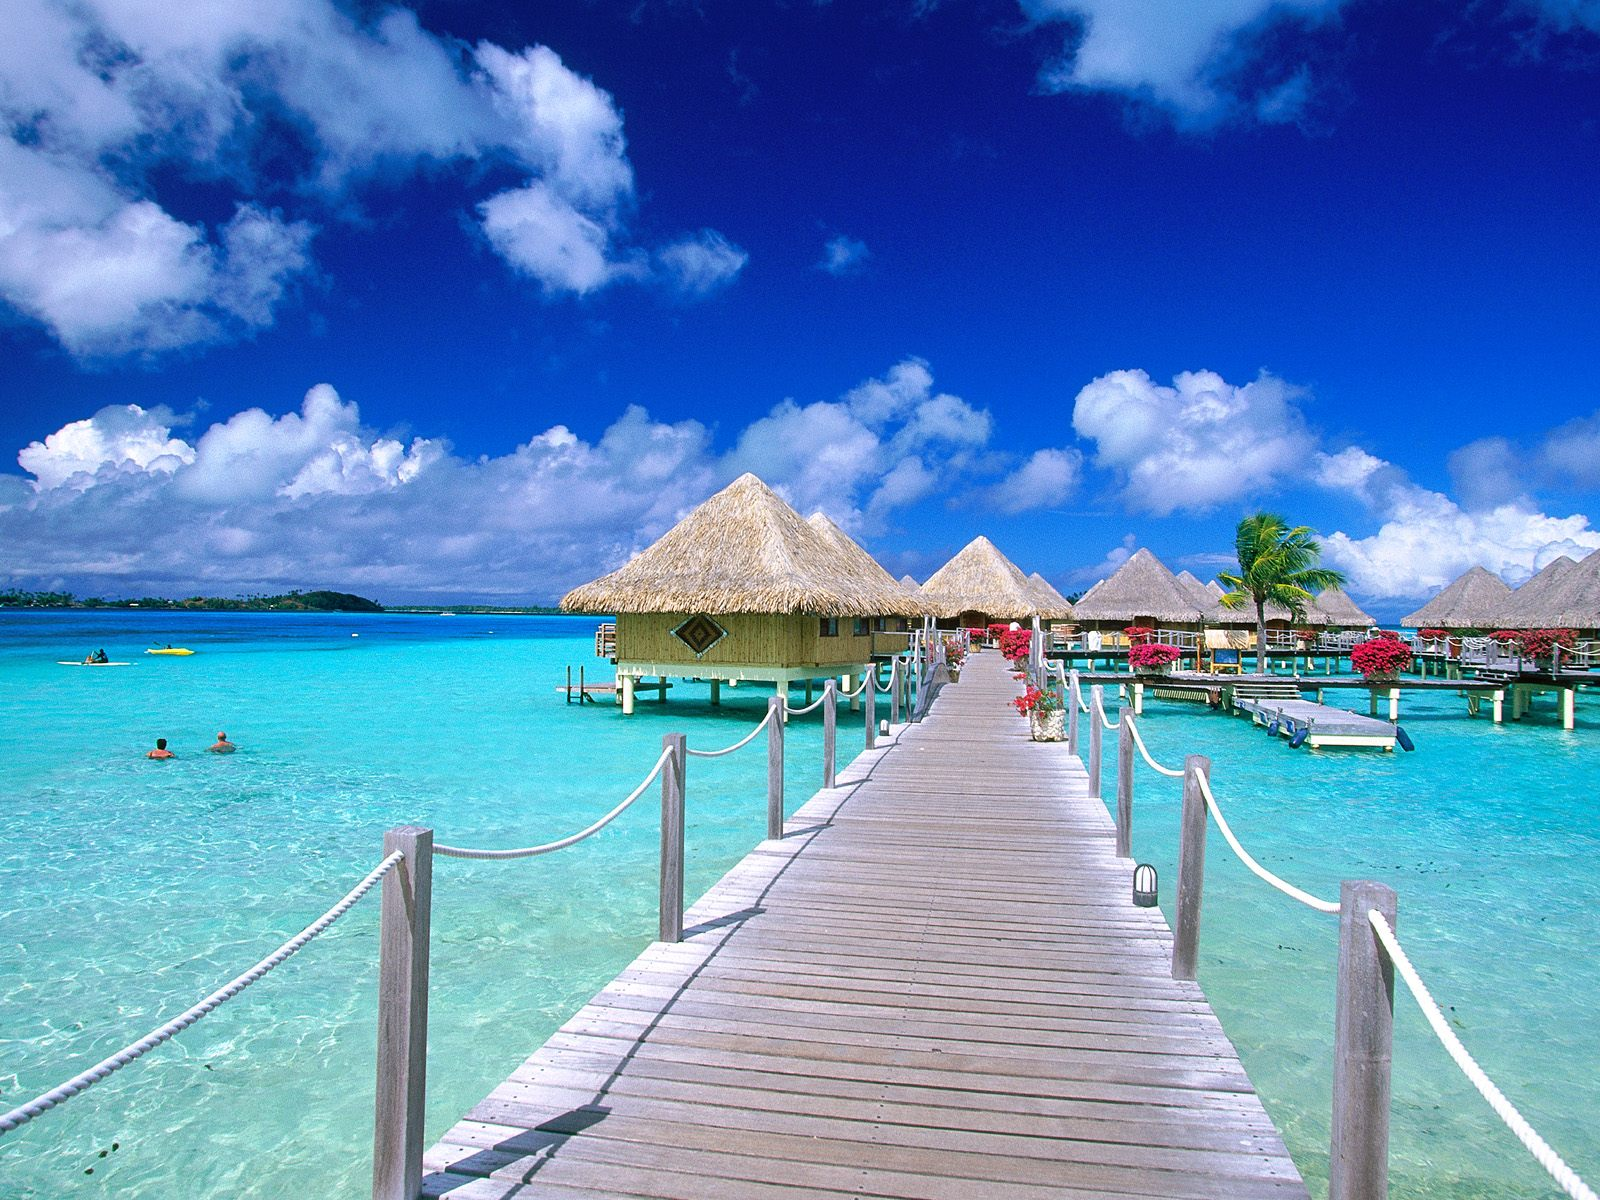 25 Tropical Beach Scenes Wallpapers | Best Design Options